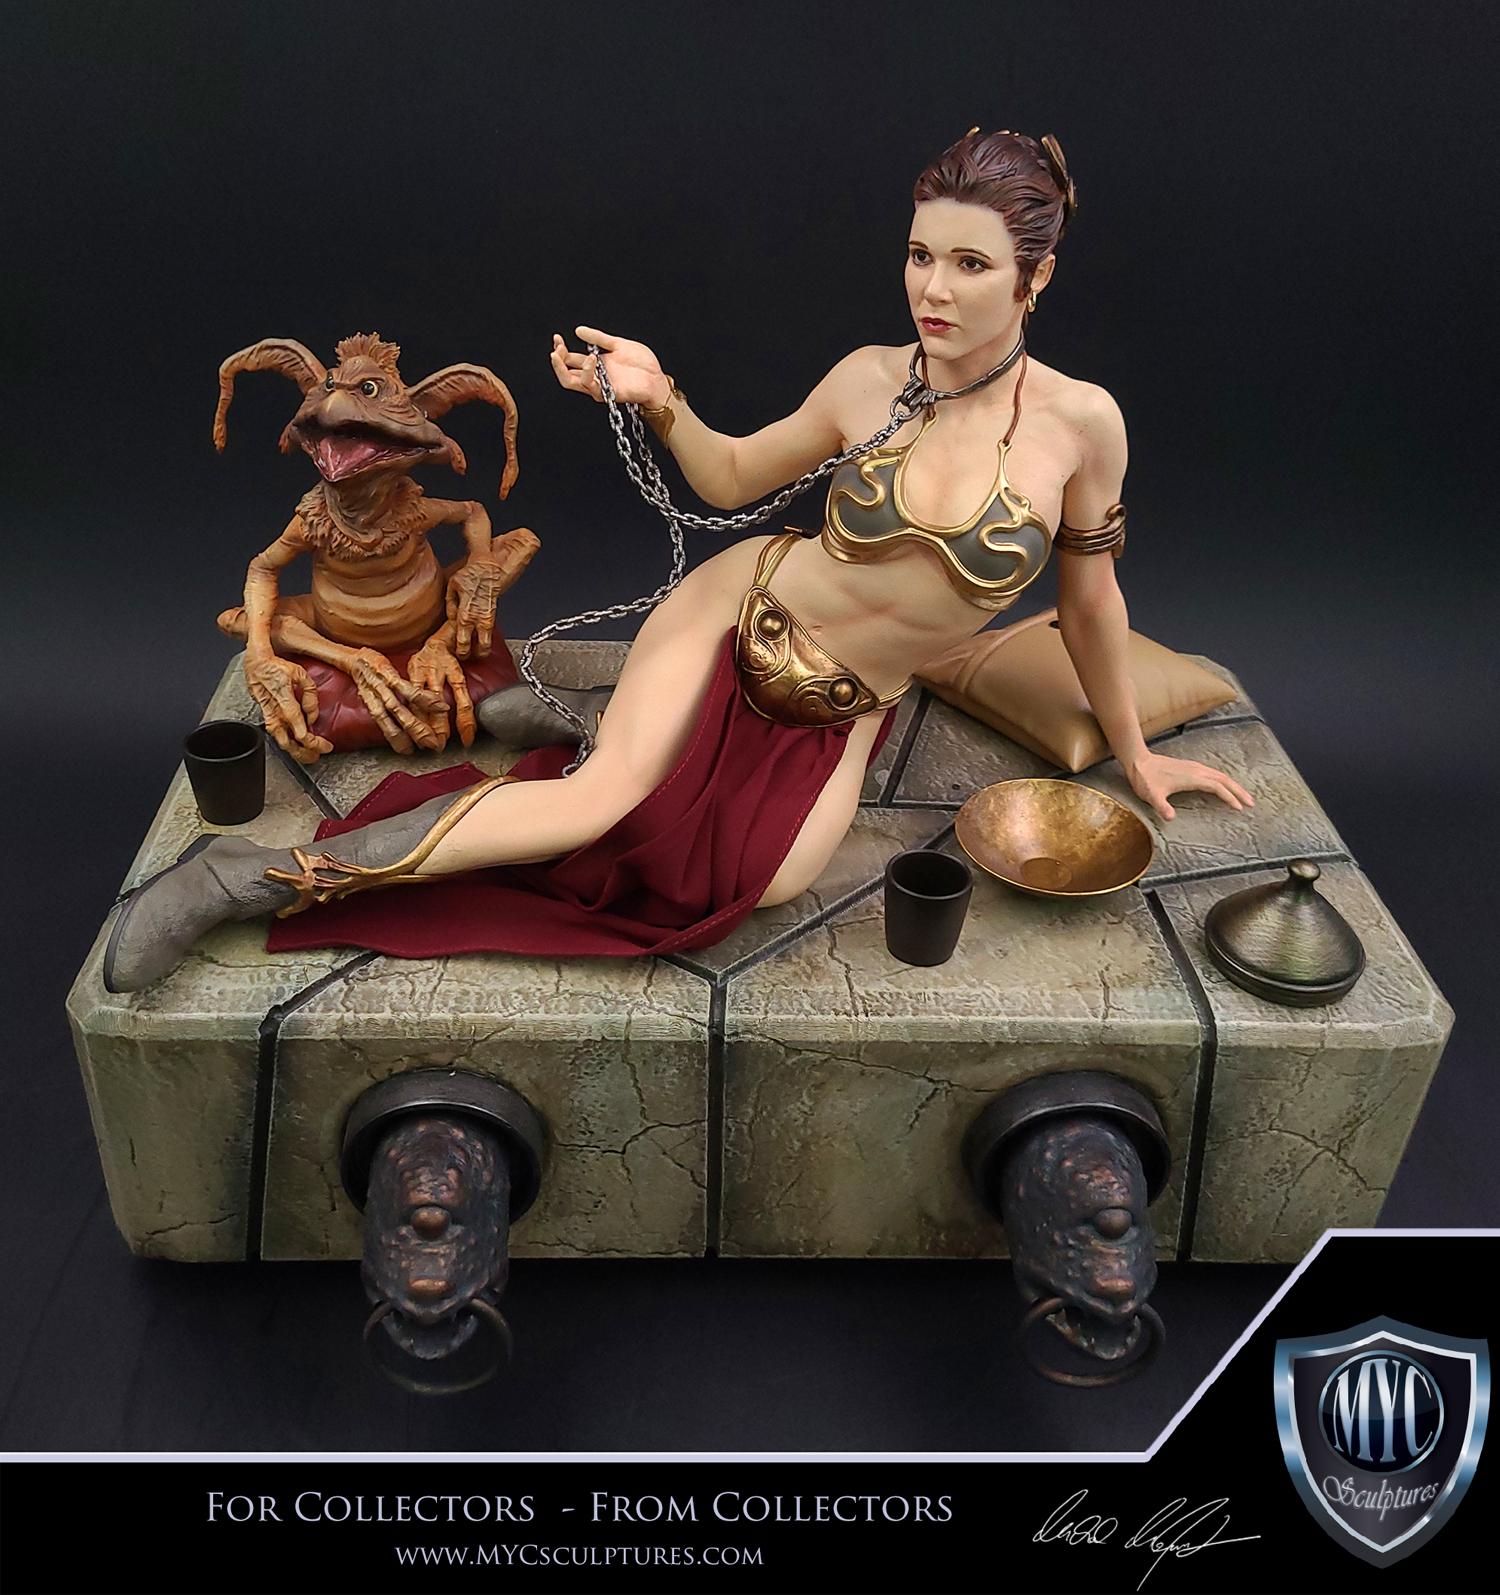 Slave_Leia_V2_MYC_Sculptures_22